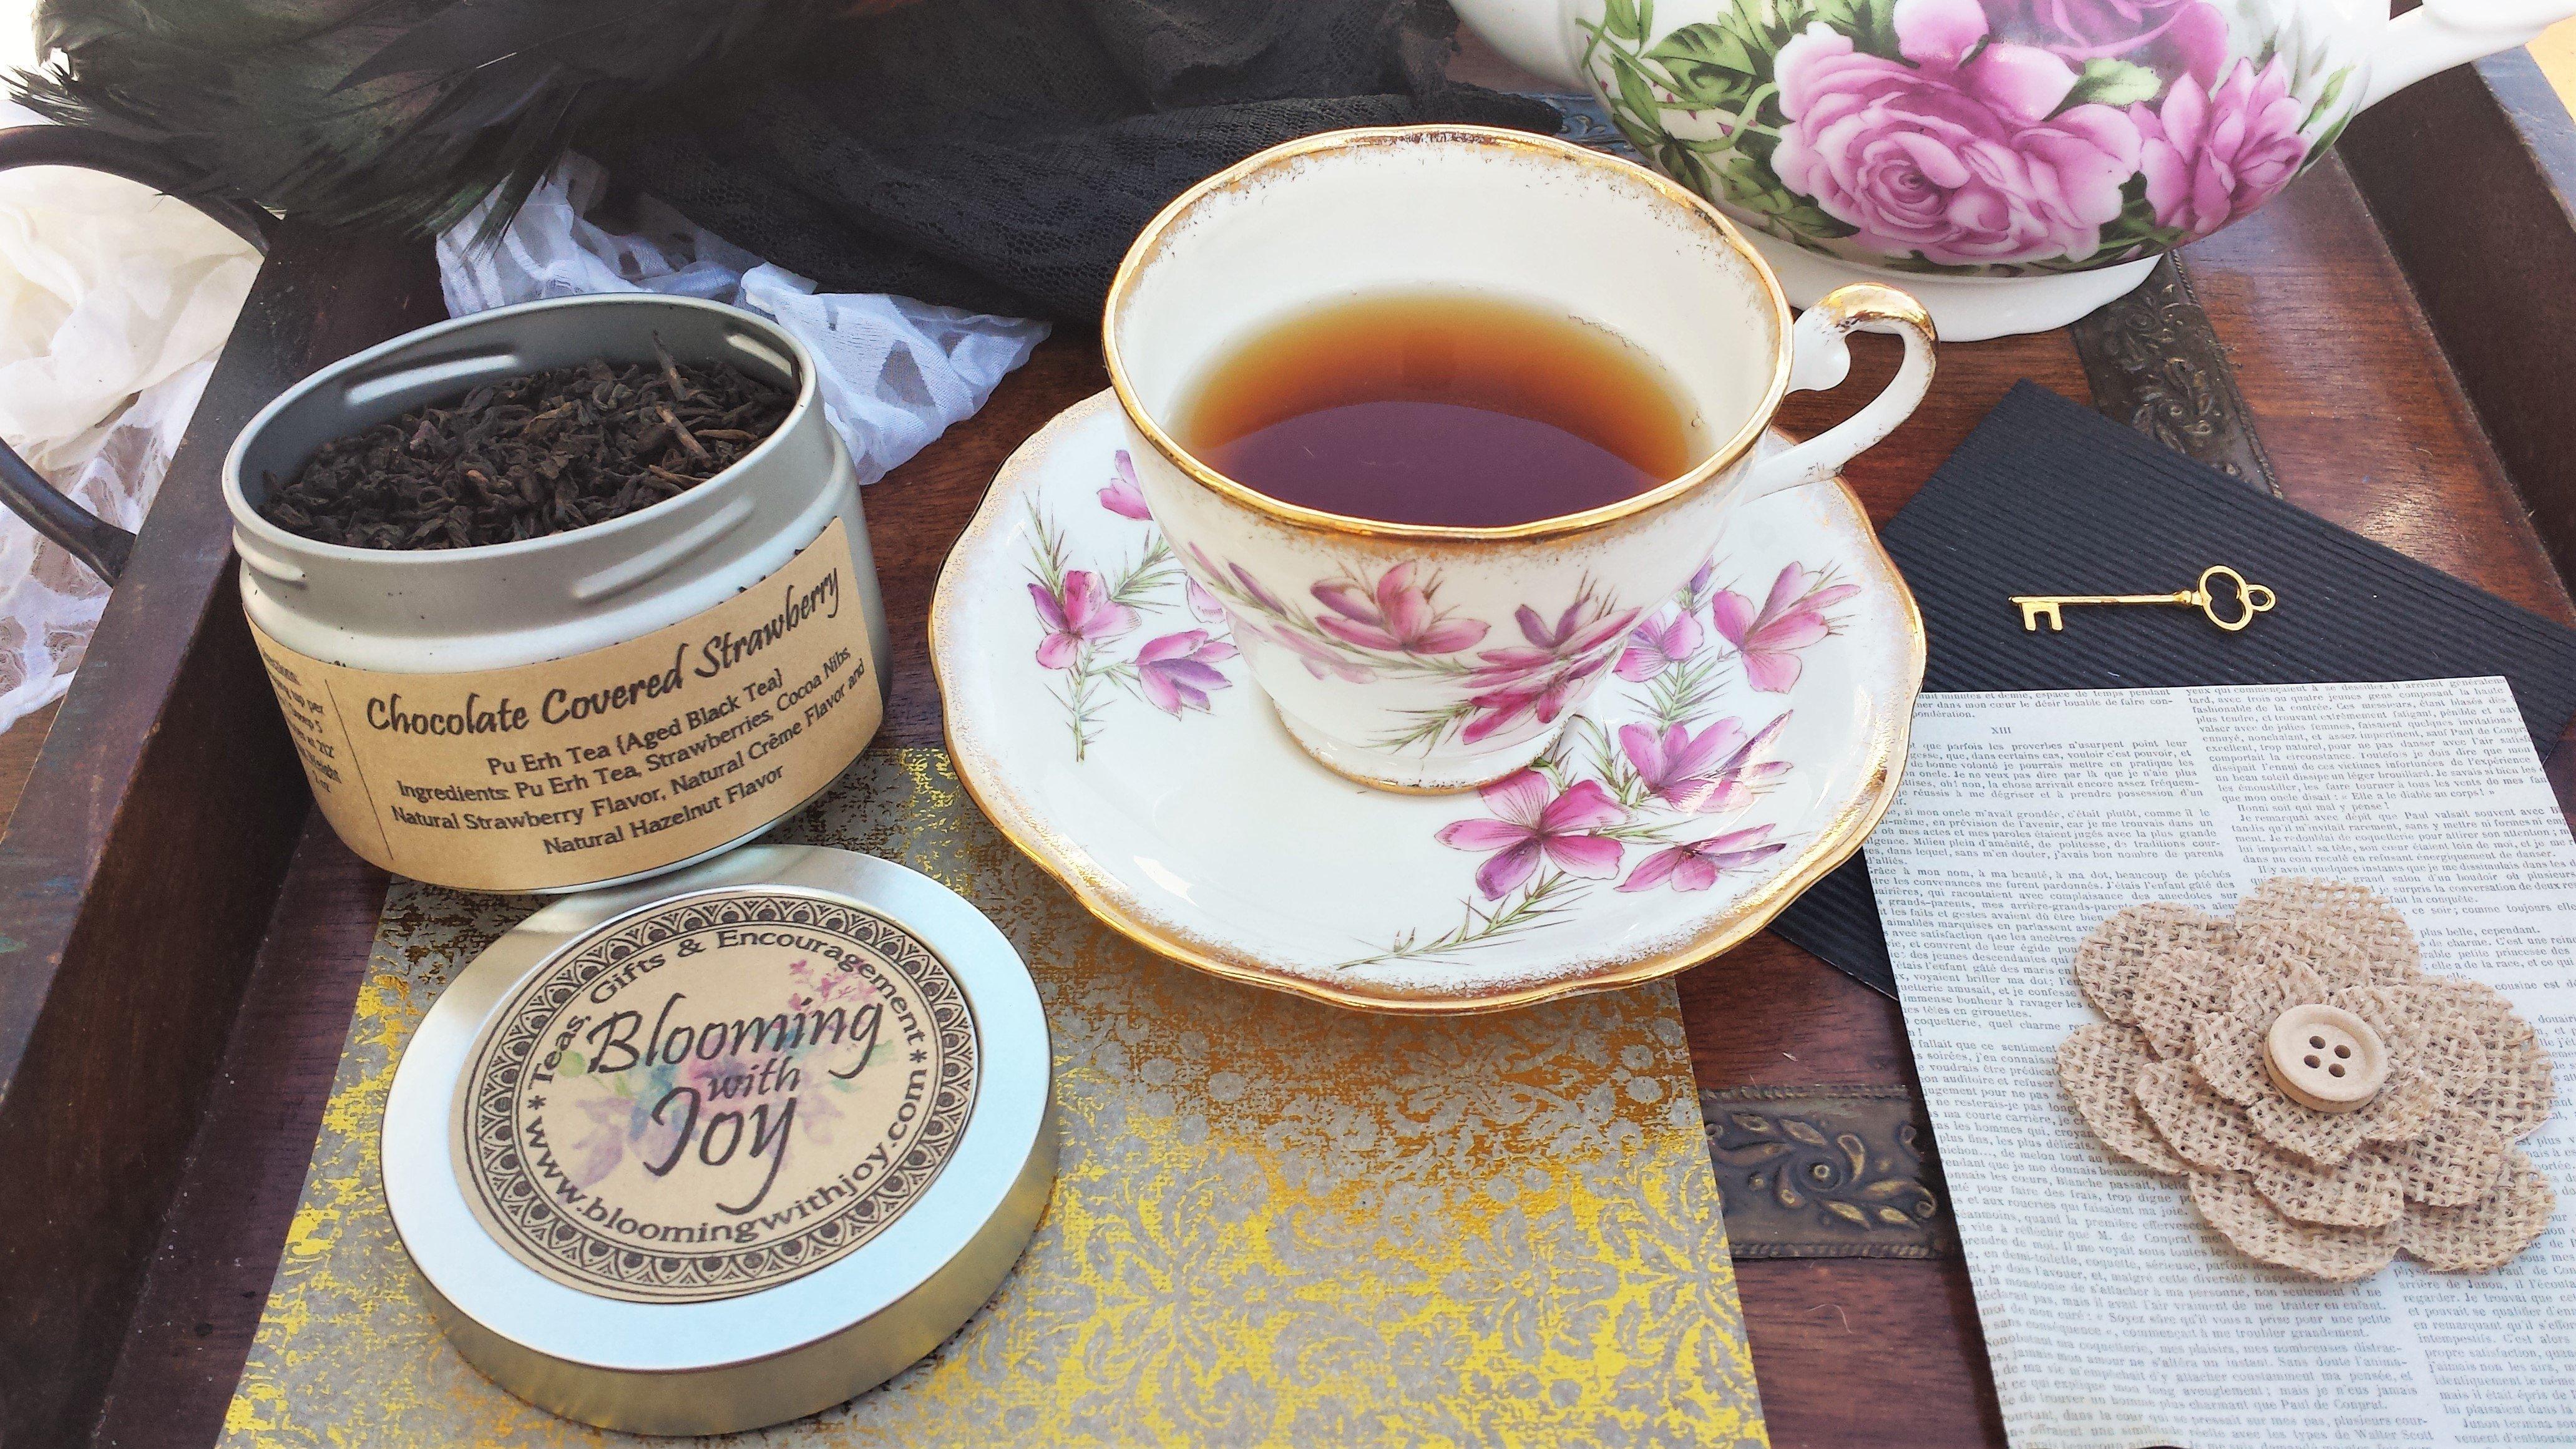 Chocolate Covered Strawberry | Pu Erh Tea